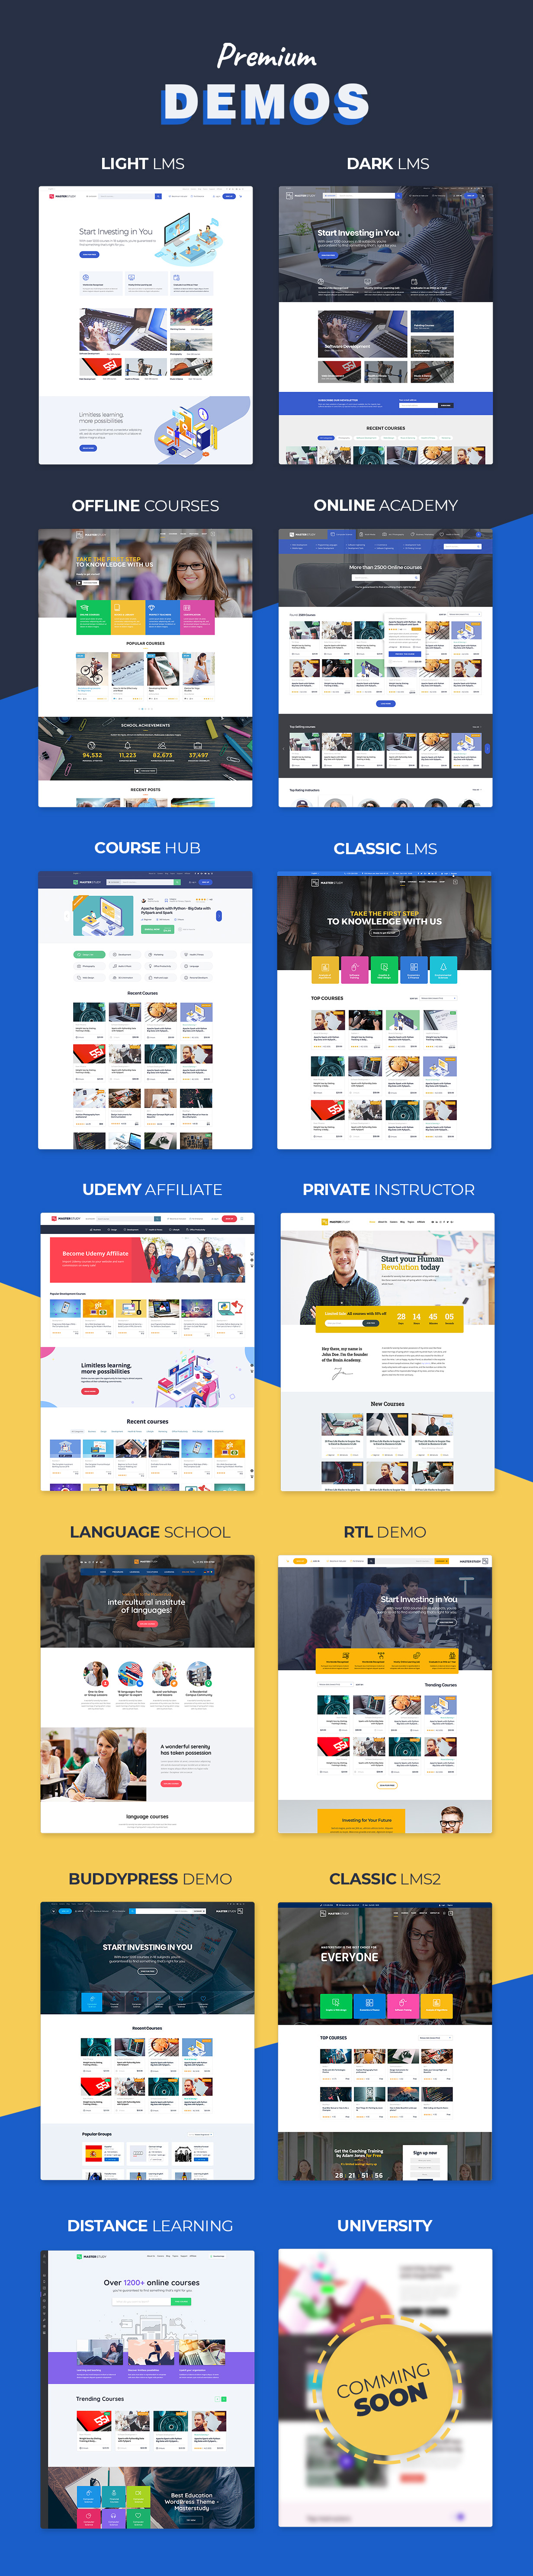 2demo - Education WordPress Theme - Masterstudy